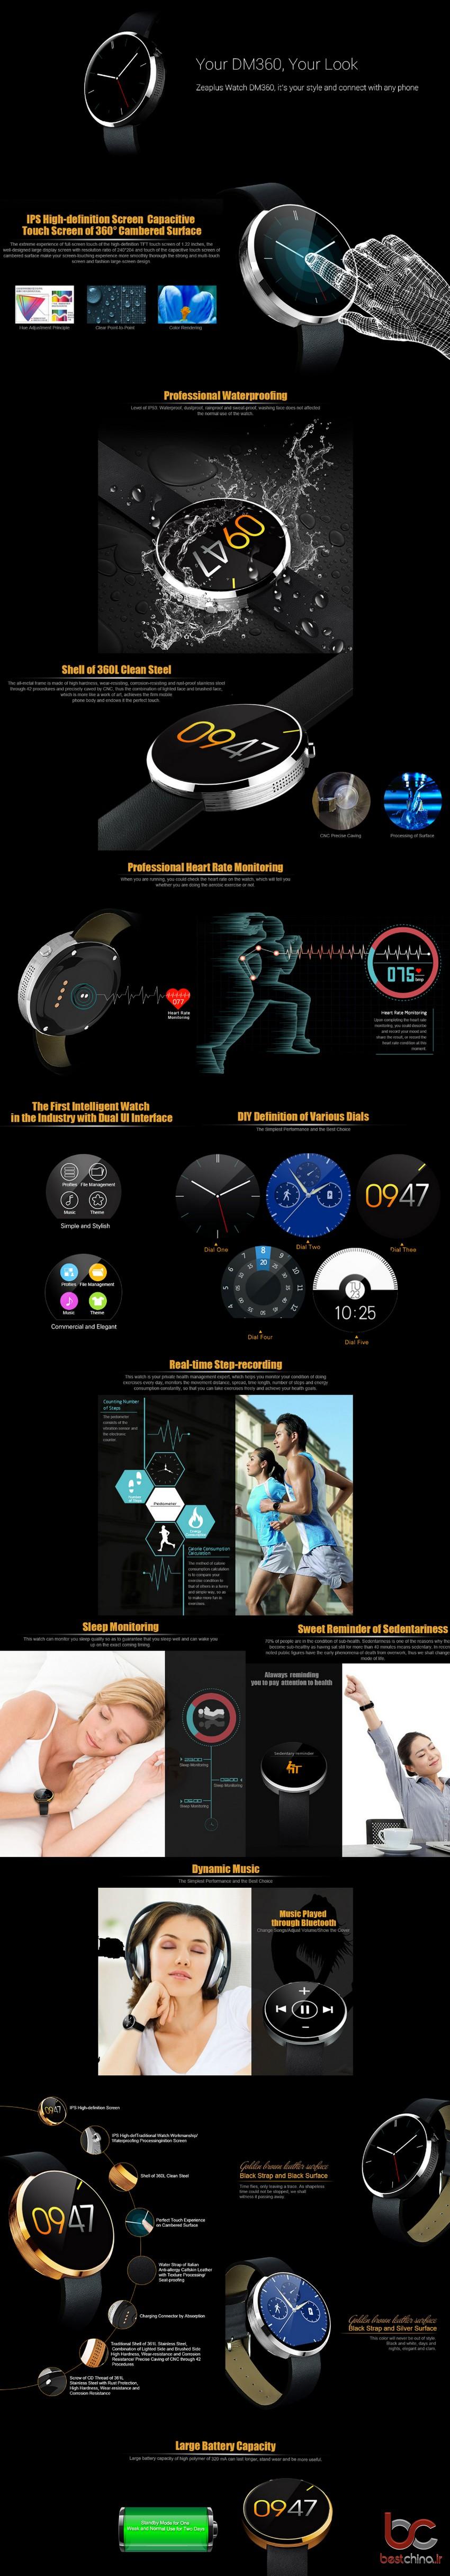 DM360 smartwatchs (1)